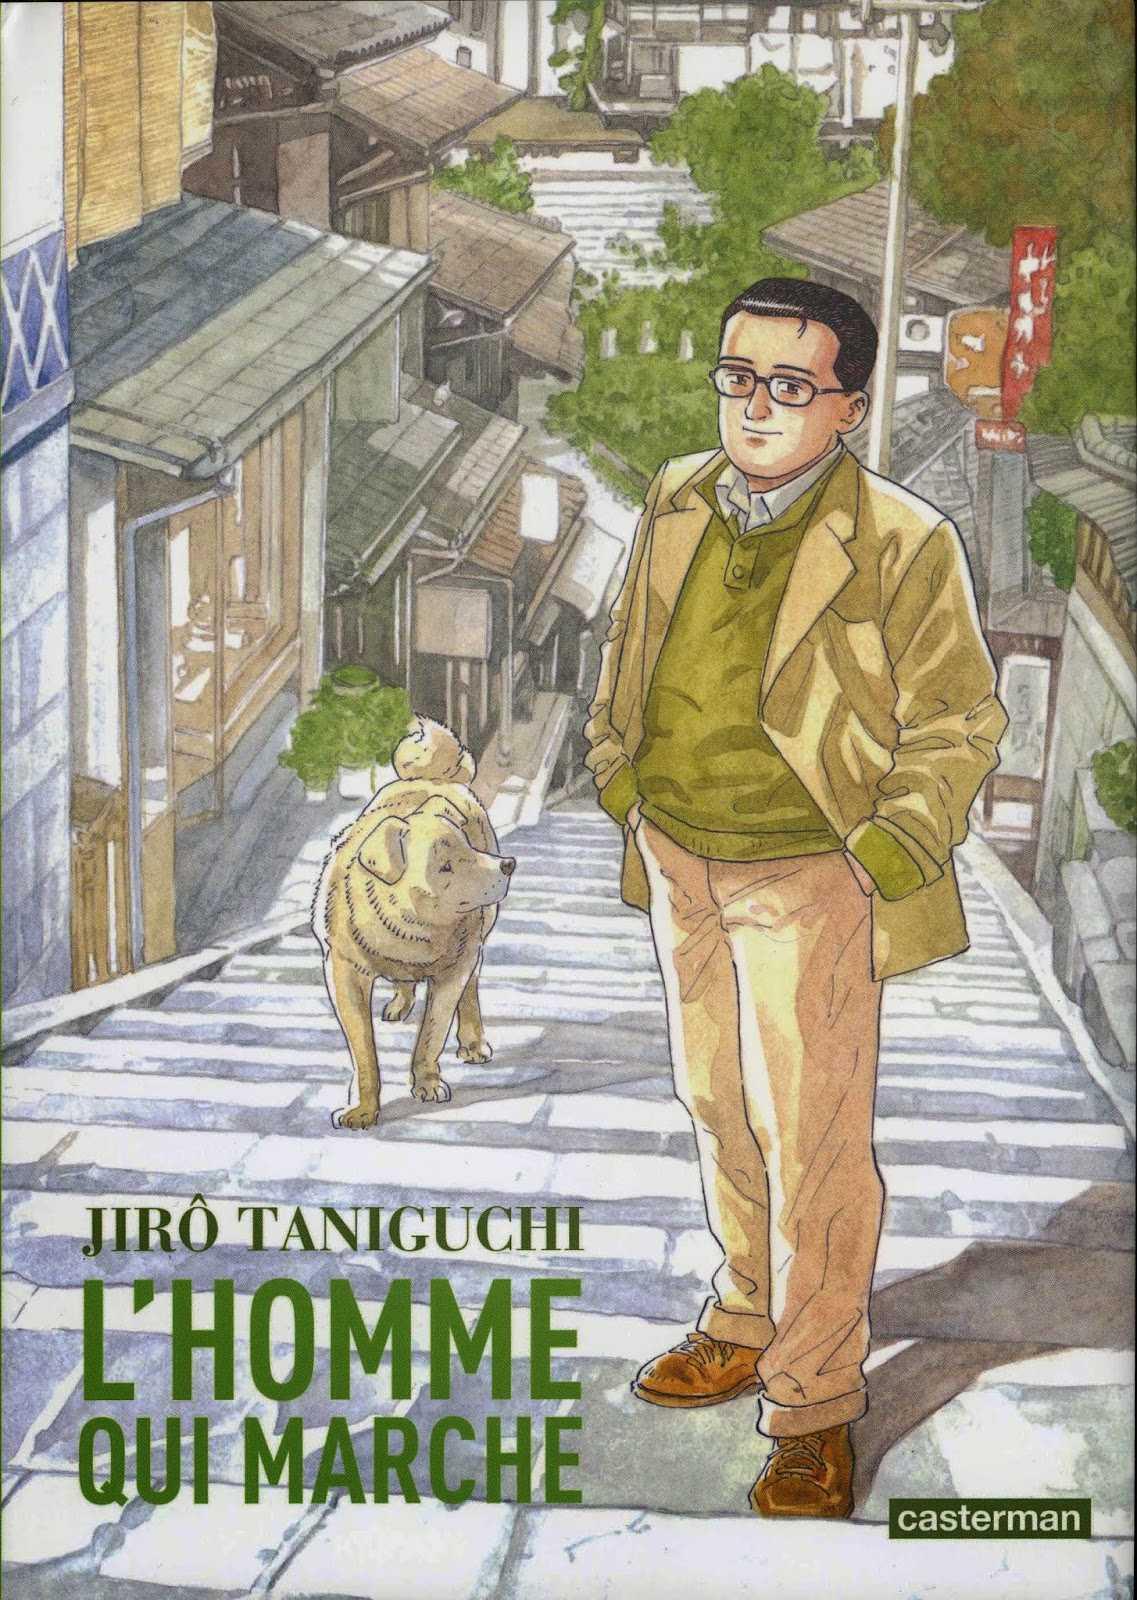 Jirō Taniguchi, le plus franco-belge des mangakas, sera à Angoulême 2015